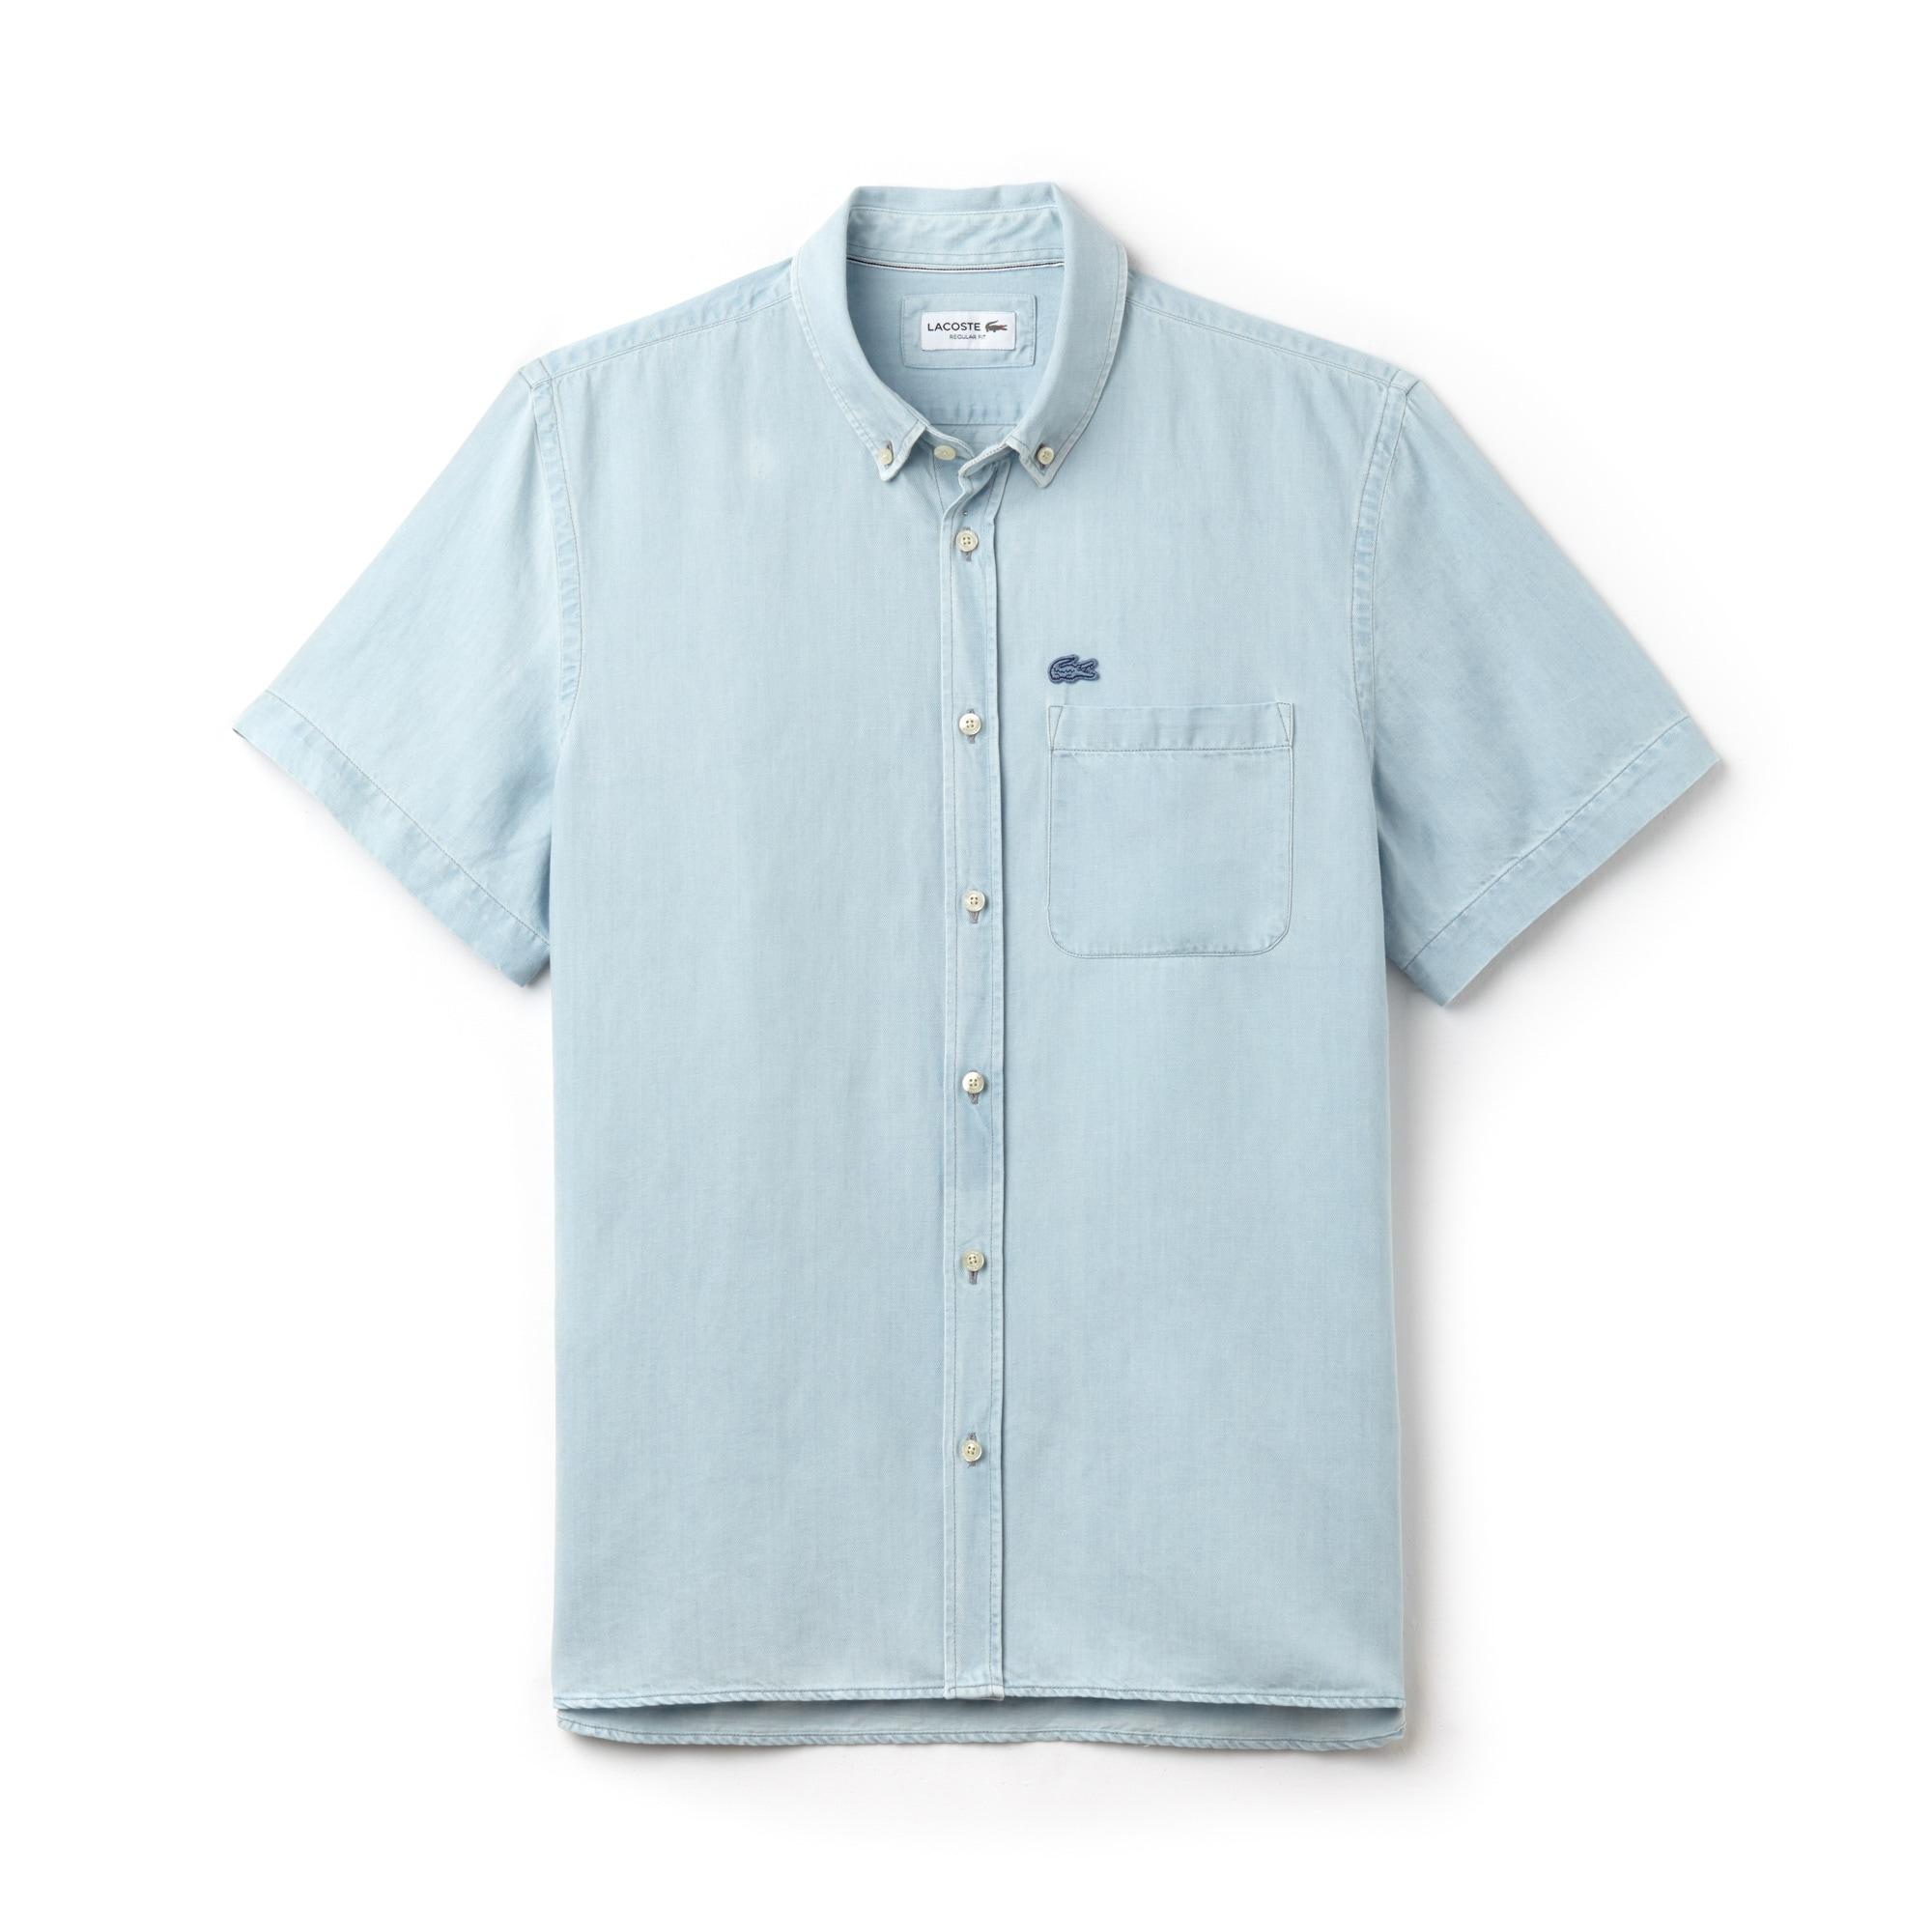 Camisa relax fit de manga corta en denim ligero